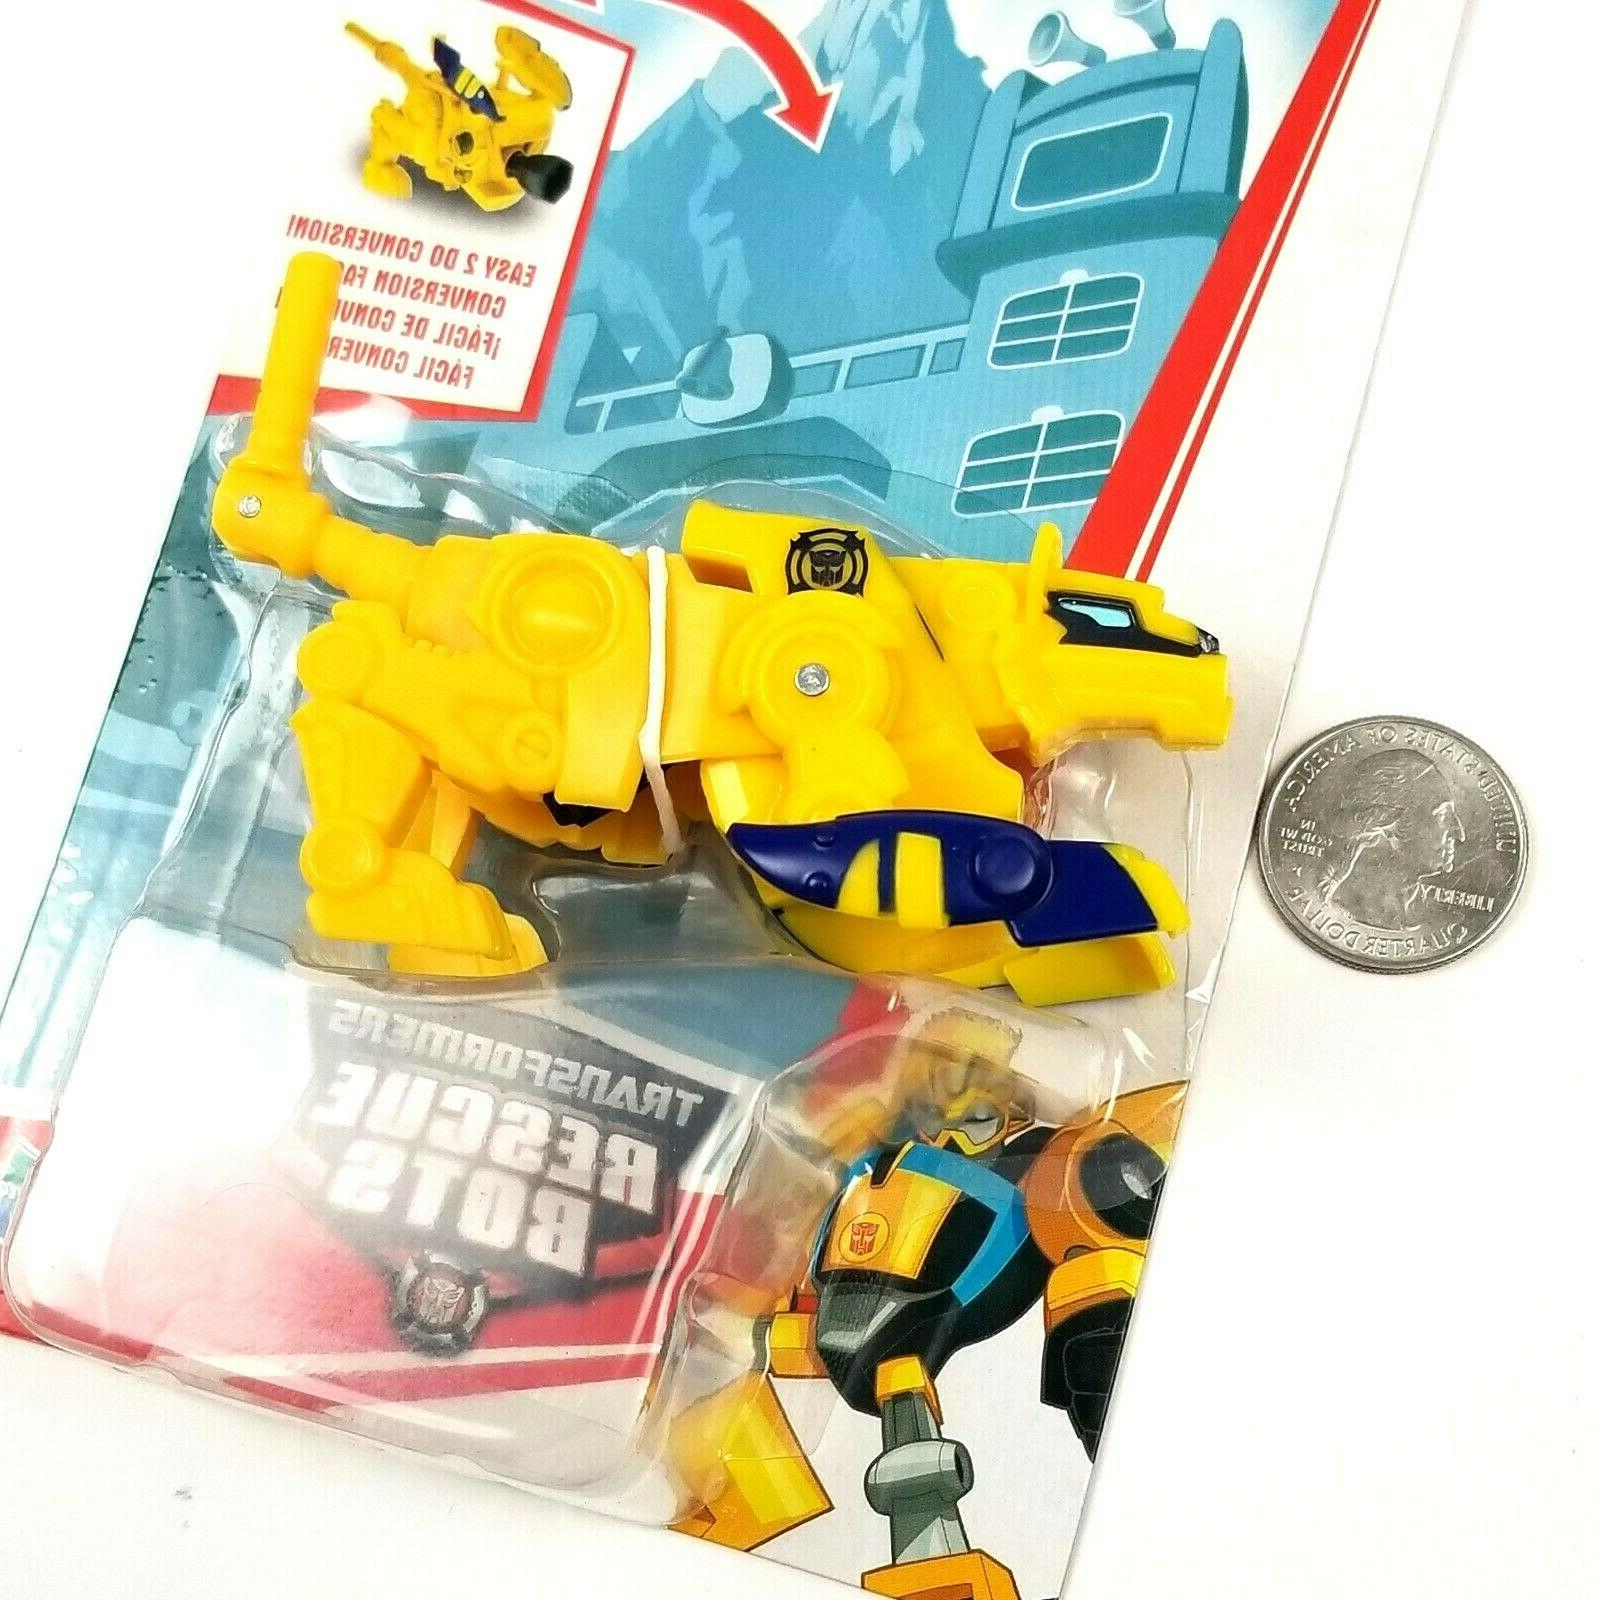 Playskool Transformers Bots - Cheetah